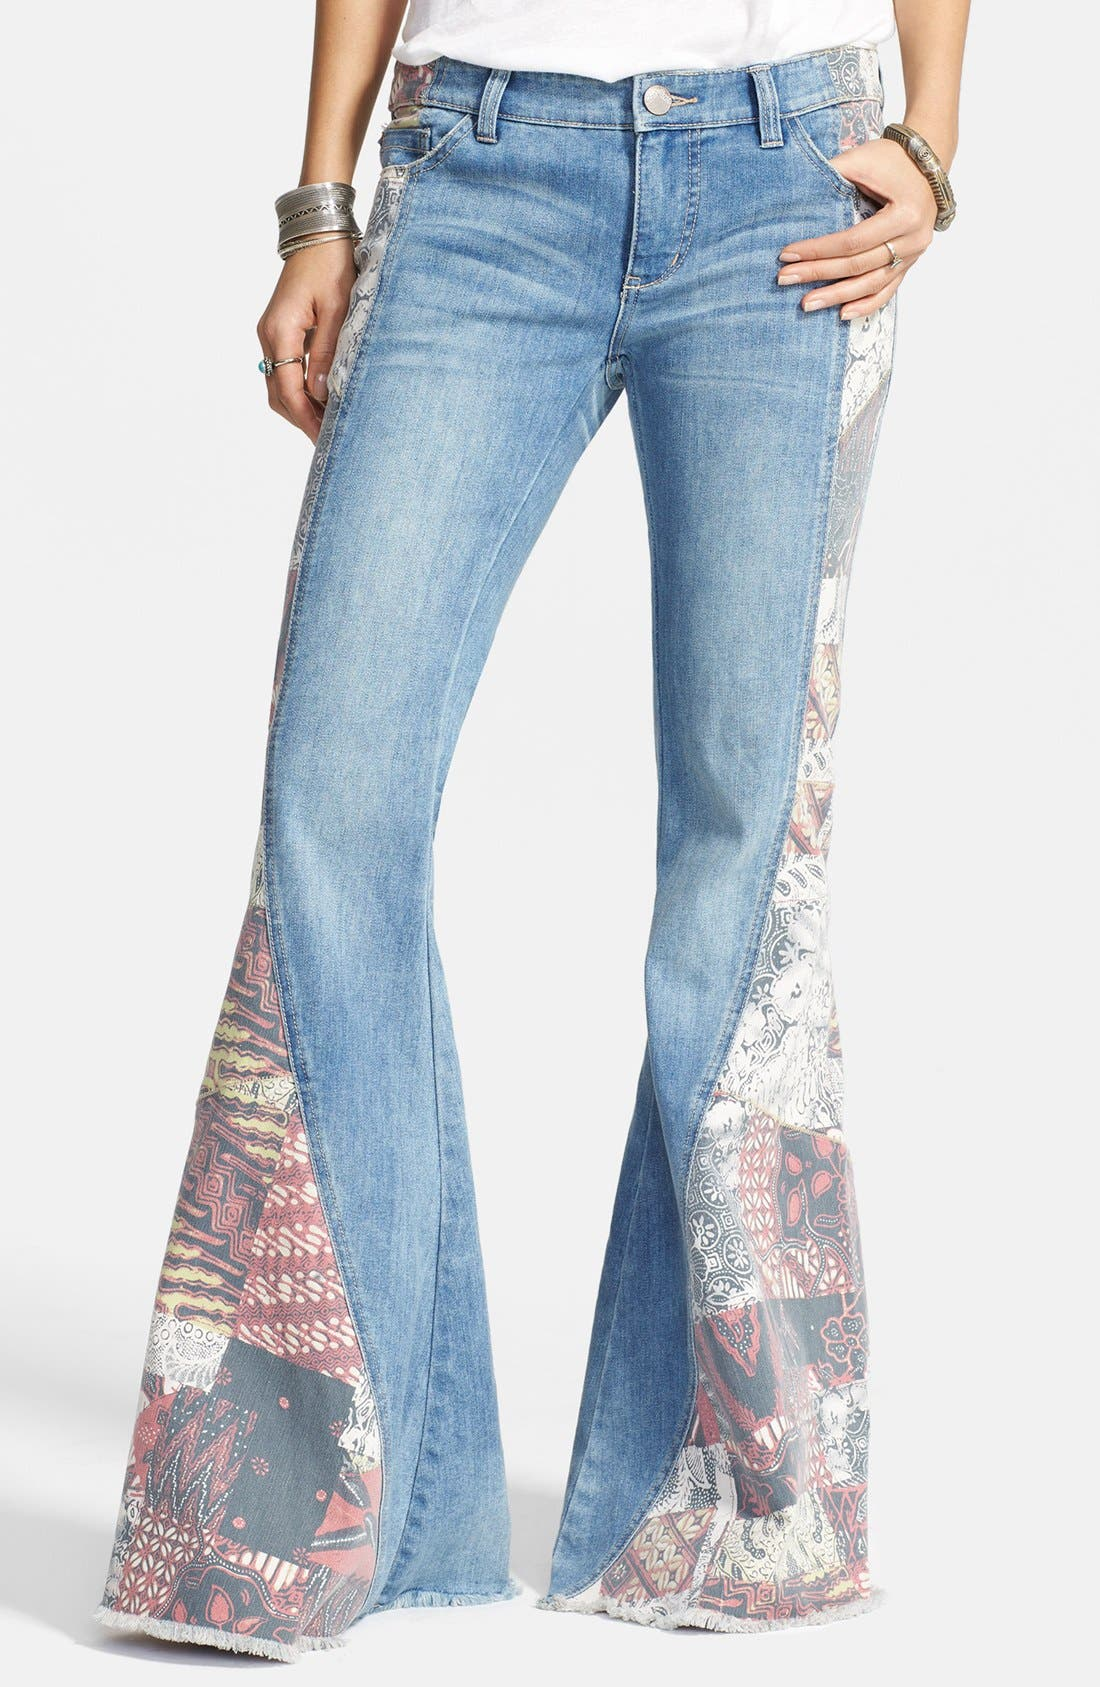 Alternate Image 1 Selected - Free People 'Bali' Patchwork Flare Leg Jeans (Indigo Combo)